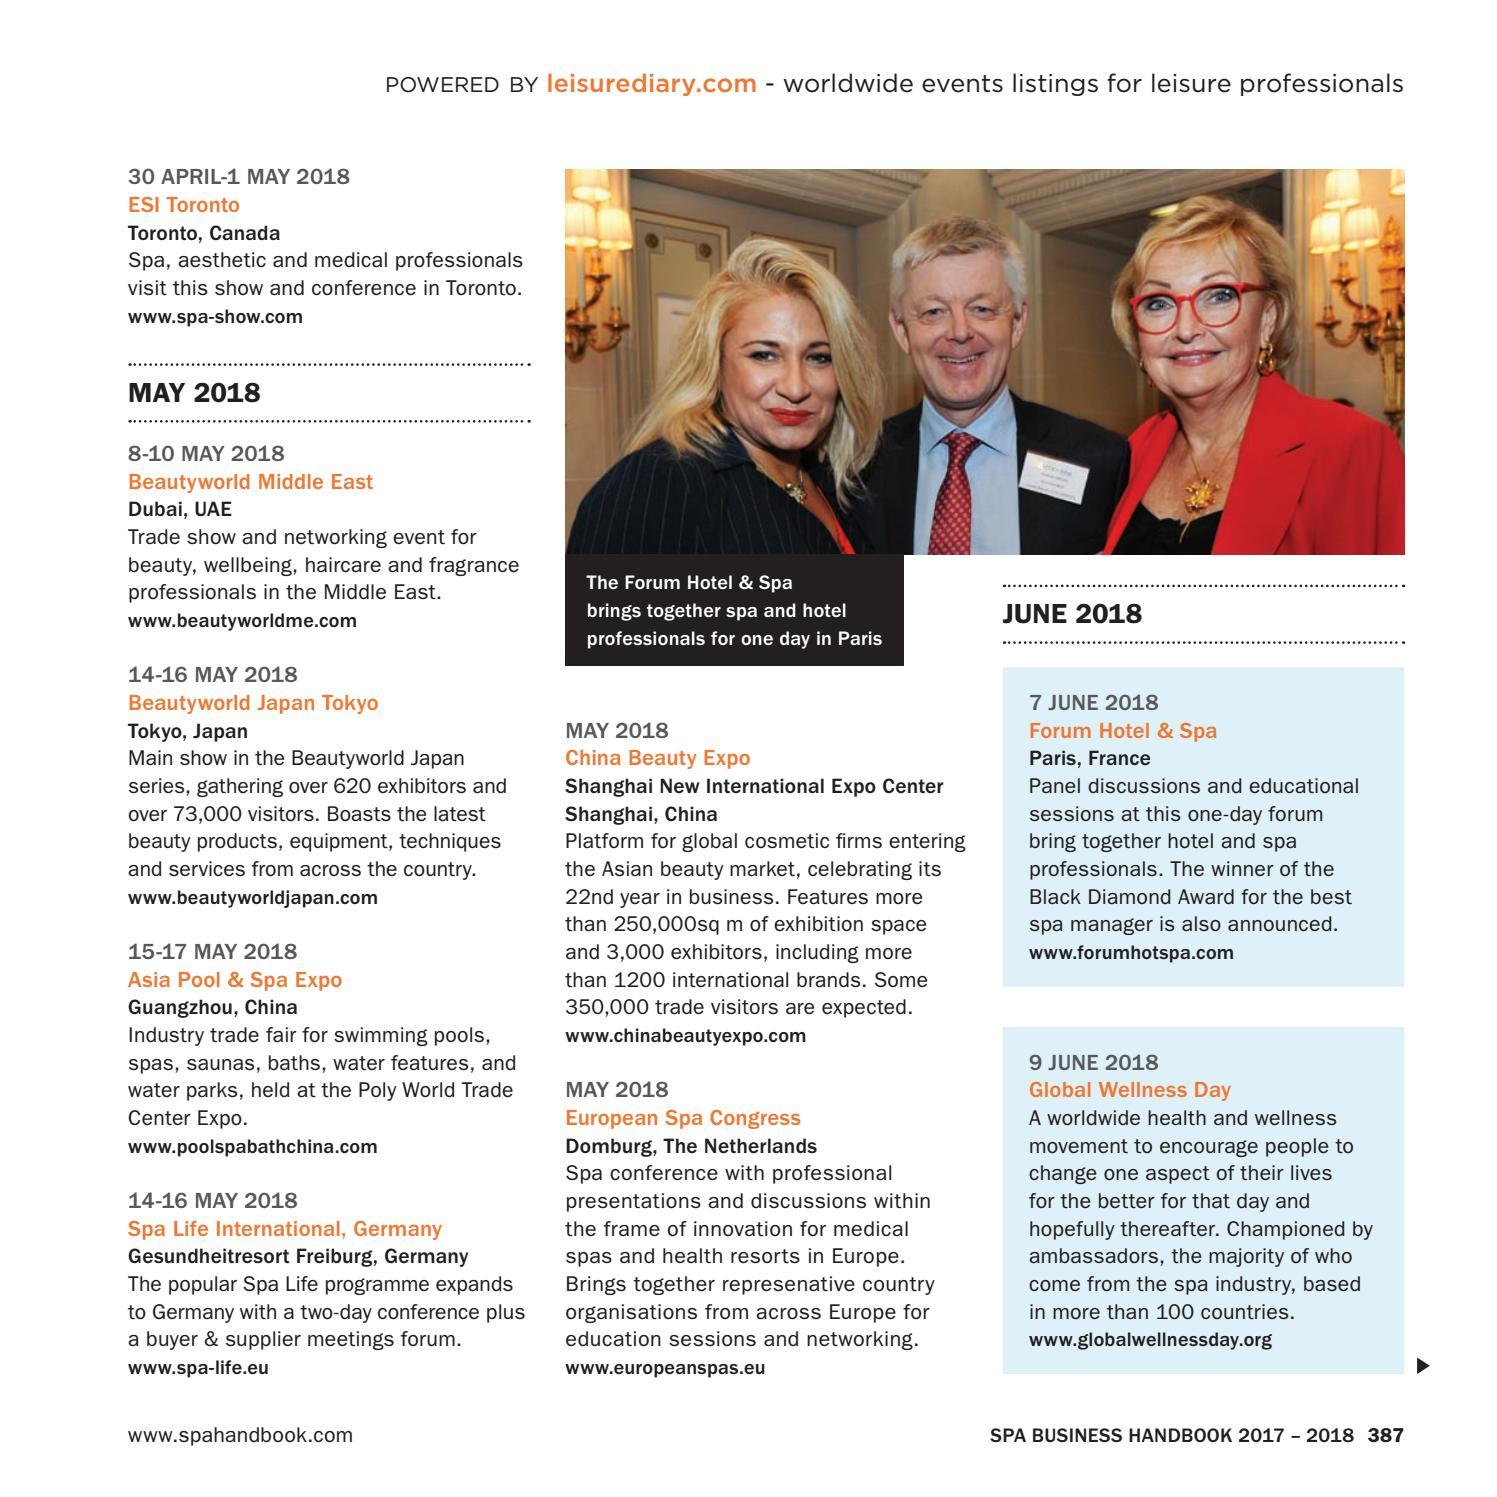 Spa Business Handbook 2017 - 2018